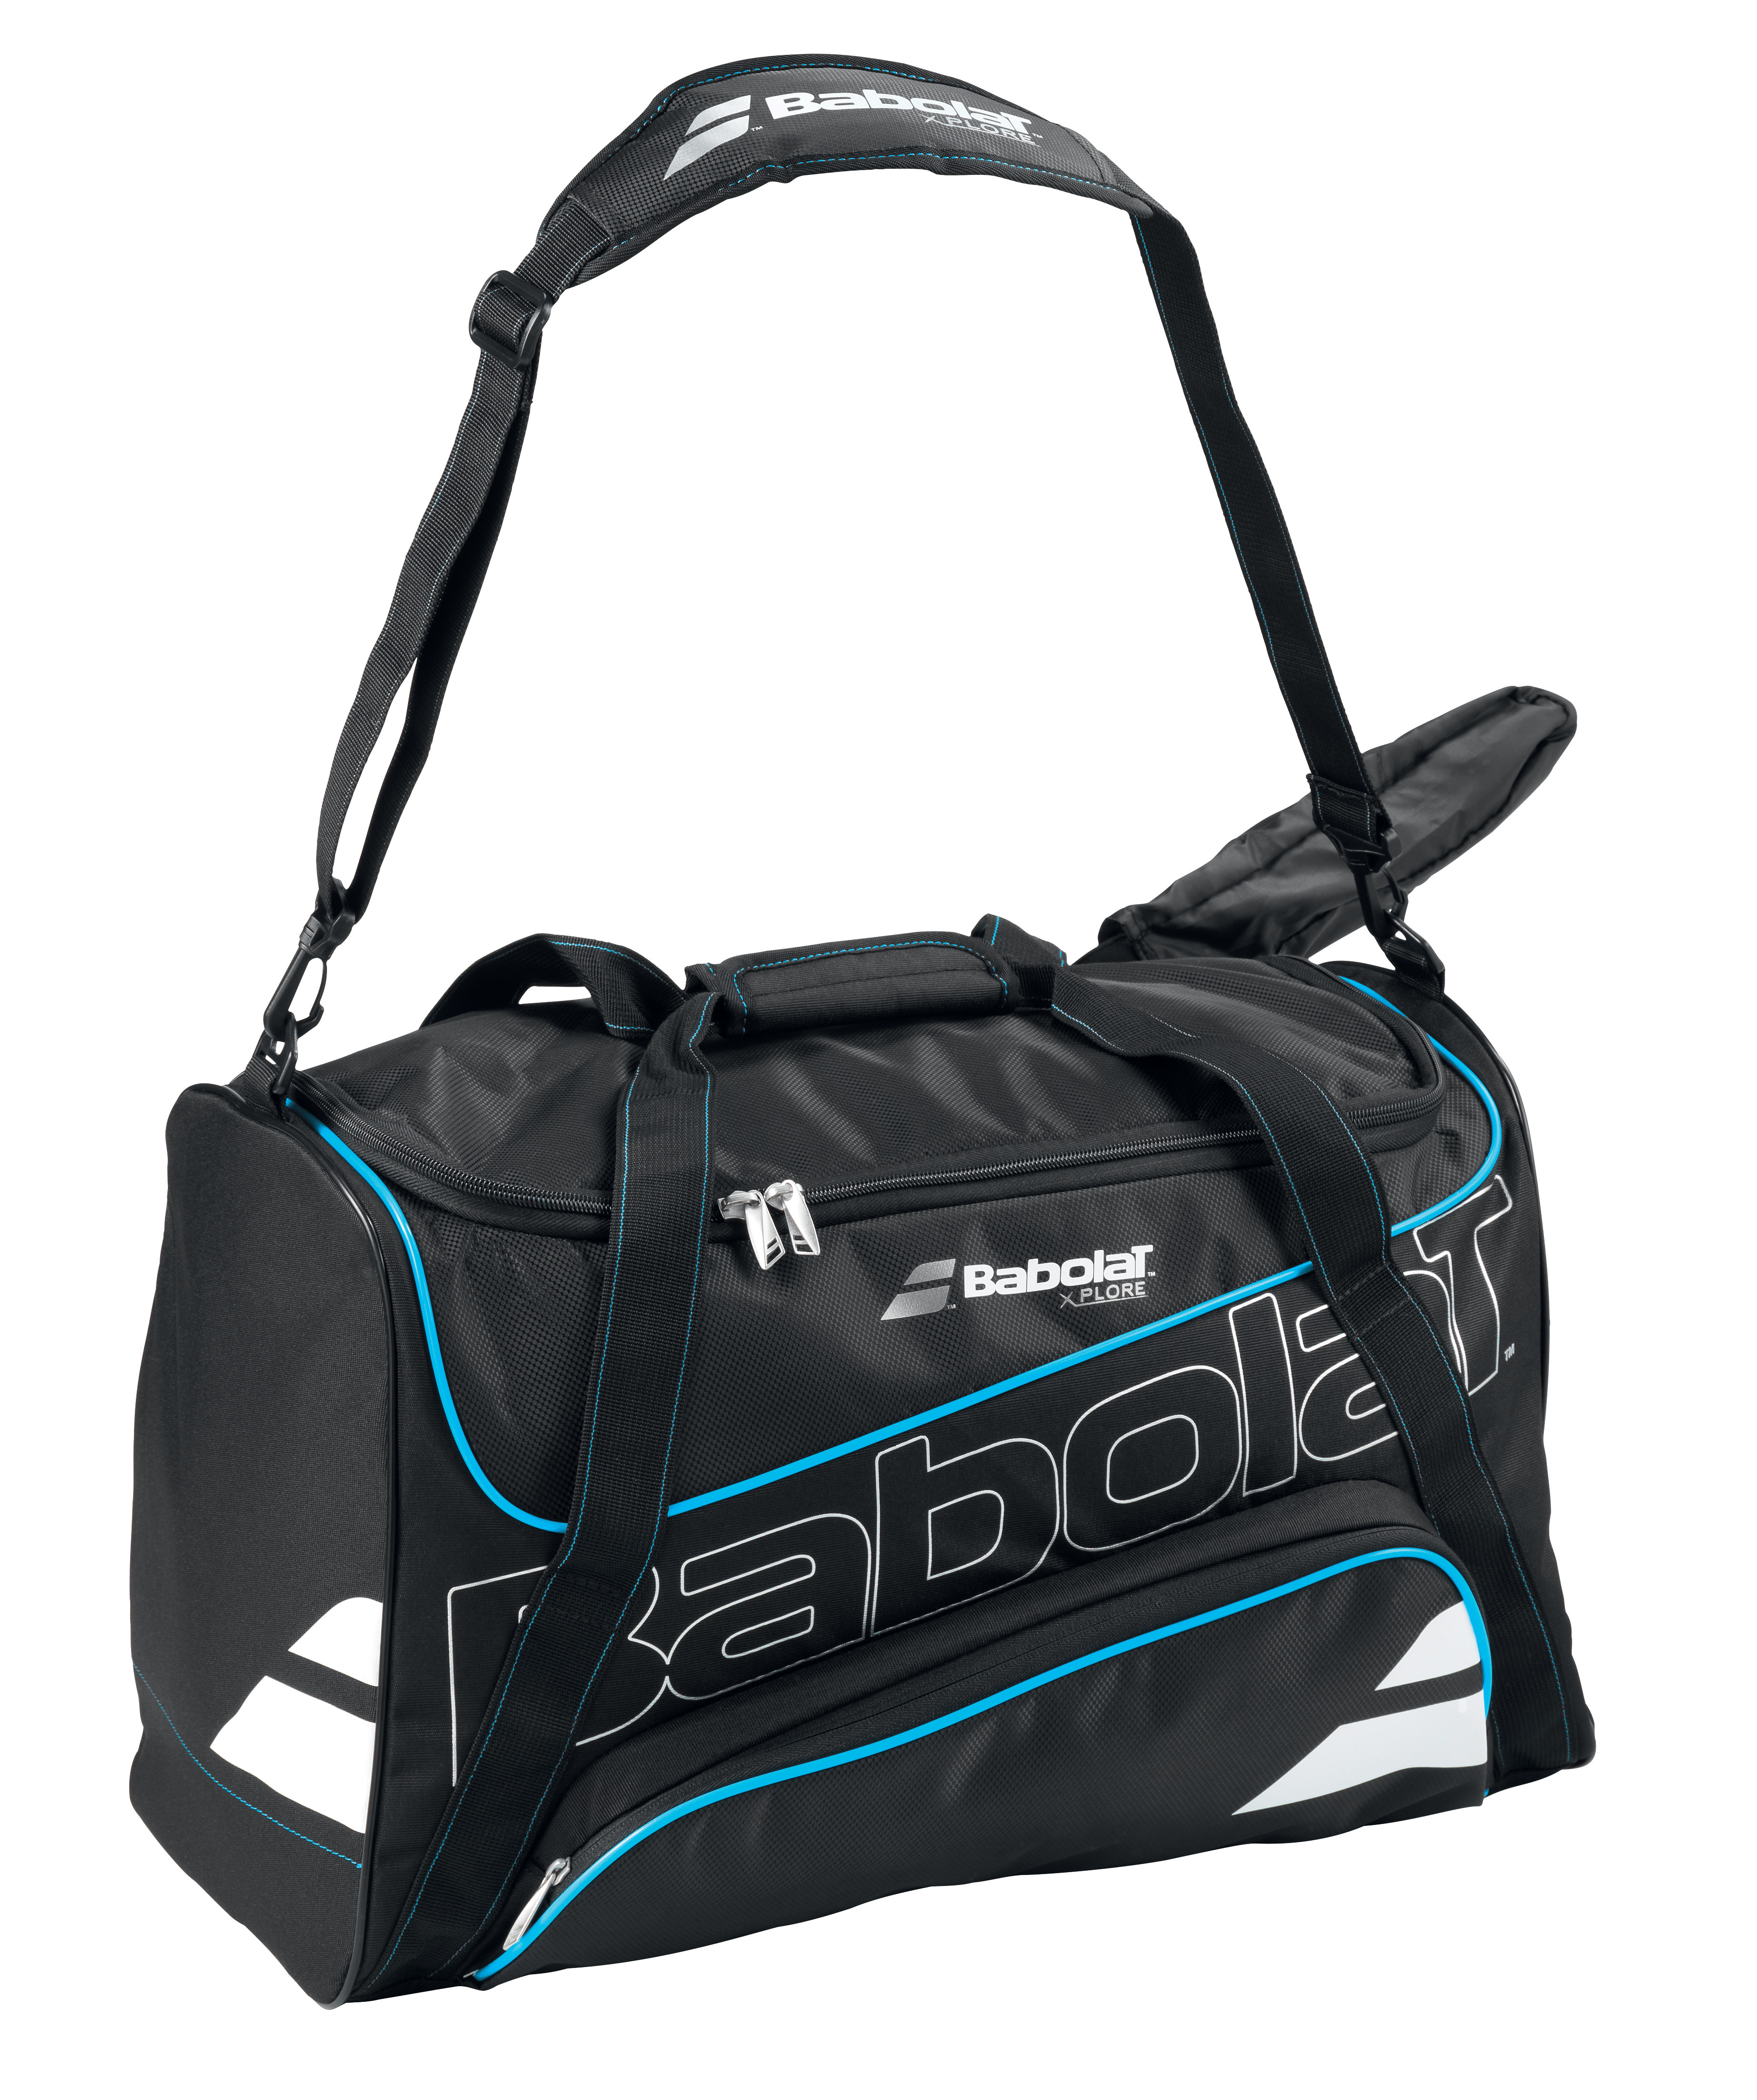 Babolat Sport Bag Xplore